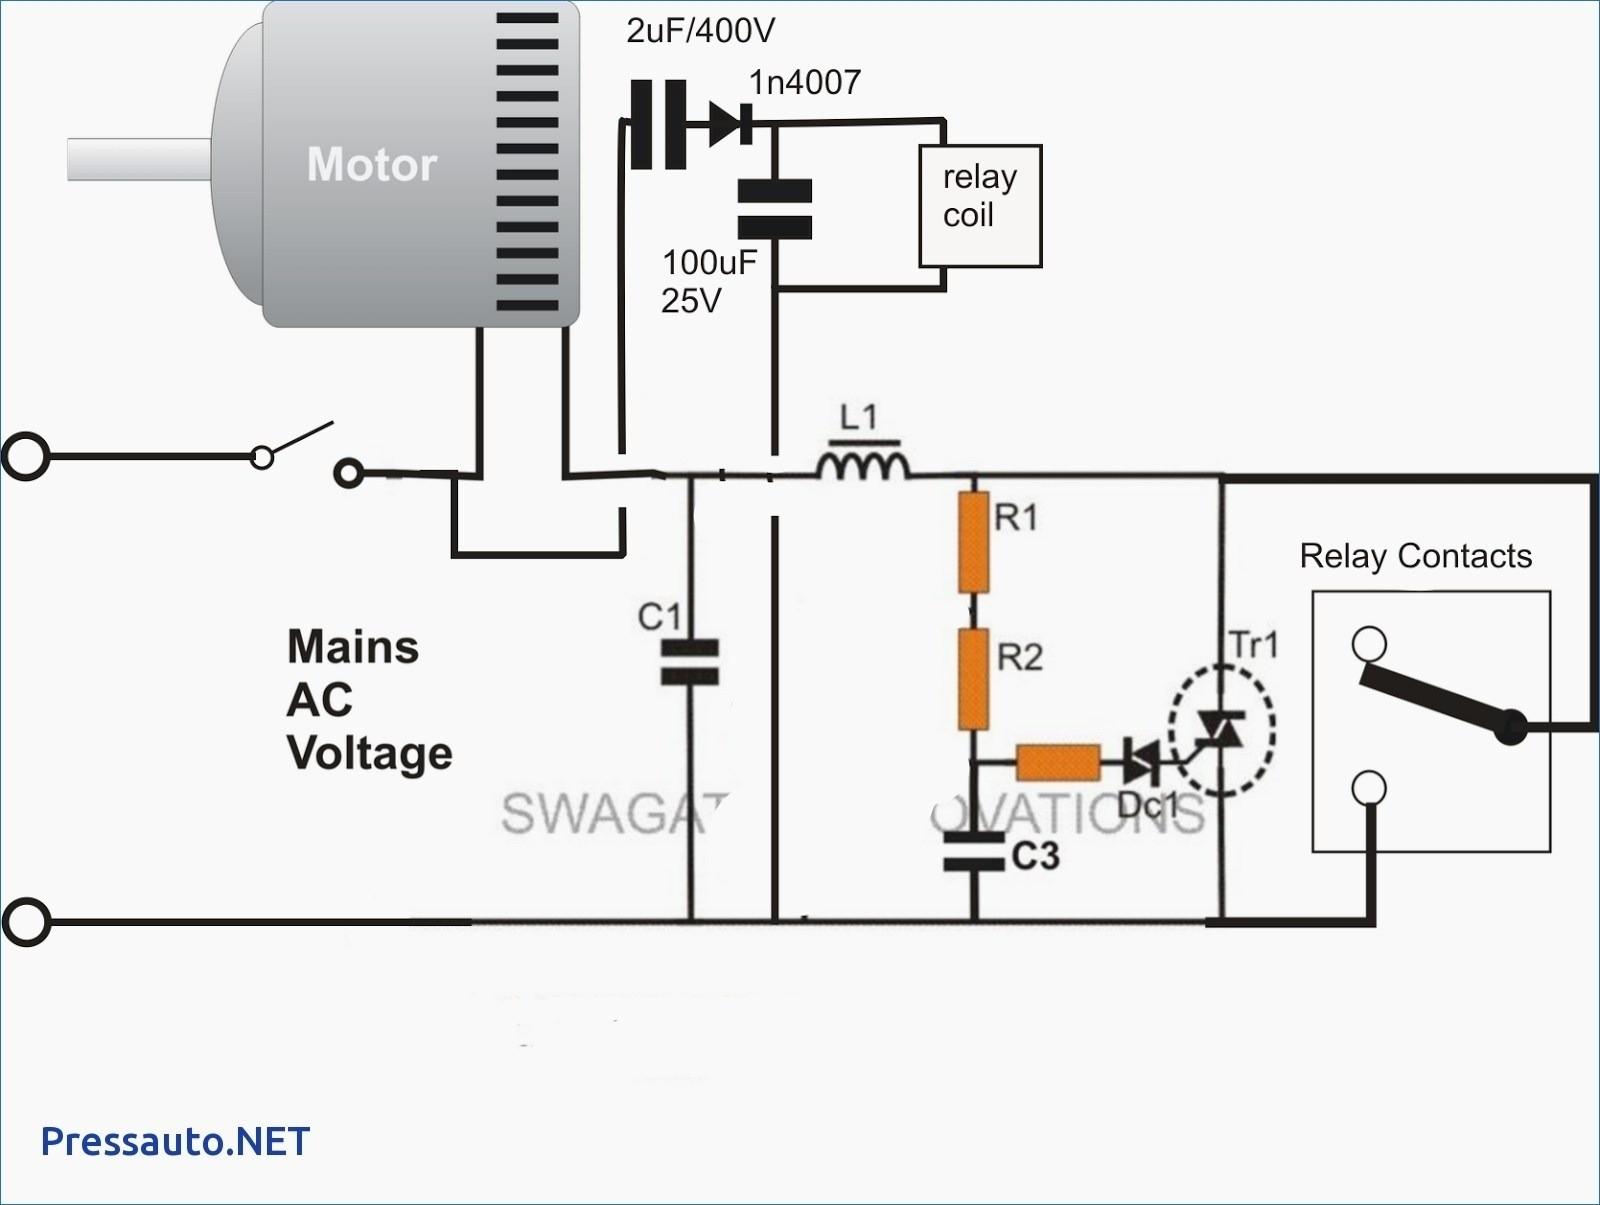 Nema Control Wiring | Wiring Diagram Database on nema l5-30 wiring diagram, nema l6-30 wiring diagram, nema 5-20 wiring diagram, nema l7-15 wiring diagram, nema l6-20 wiring diagram, nema 5-15 wiring diagram, nema l14-30 wiring diagram,